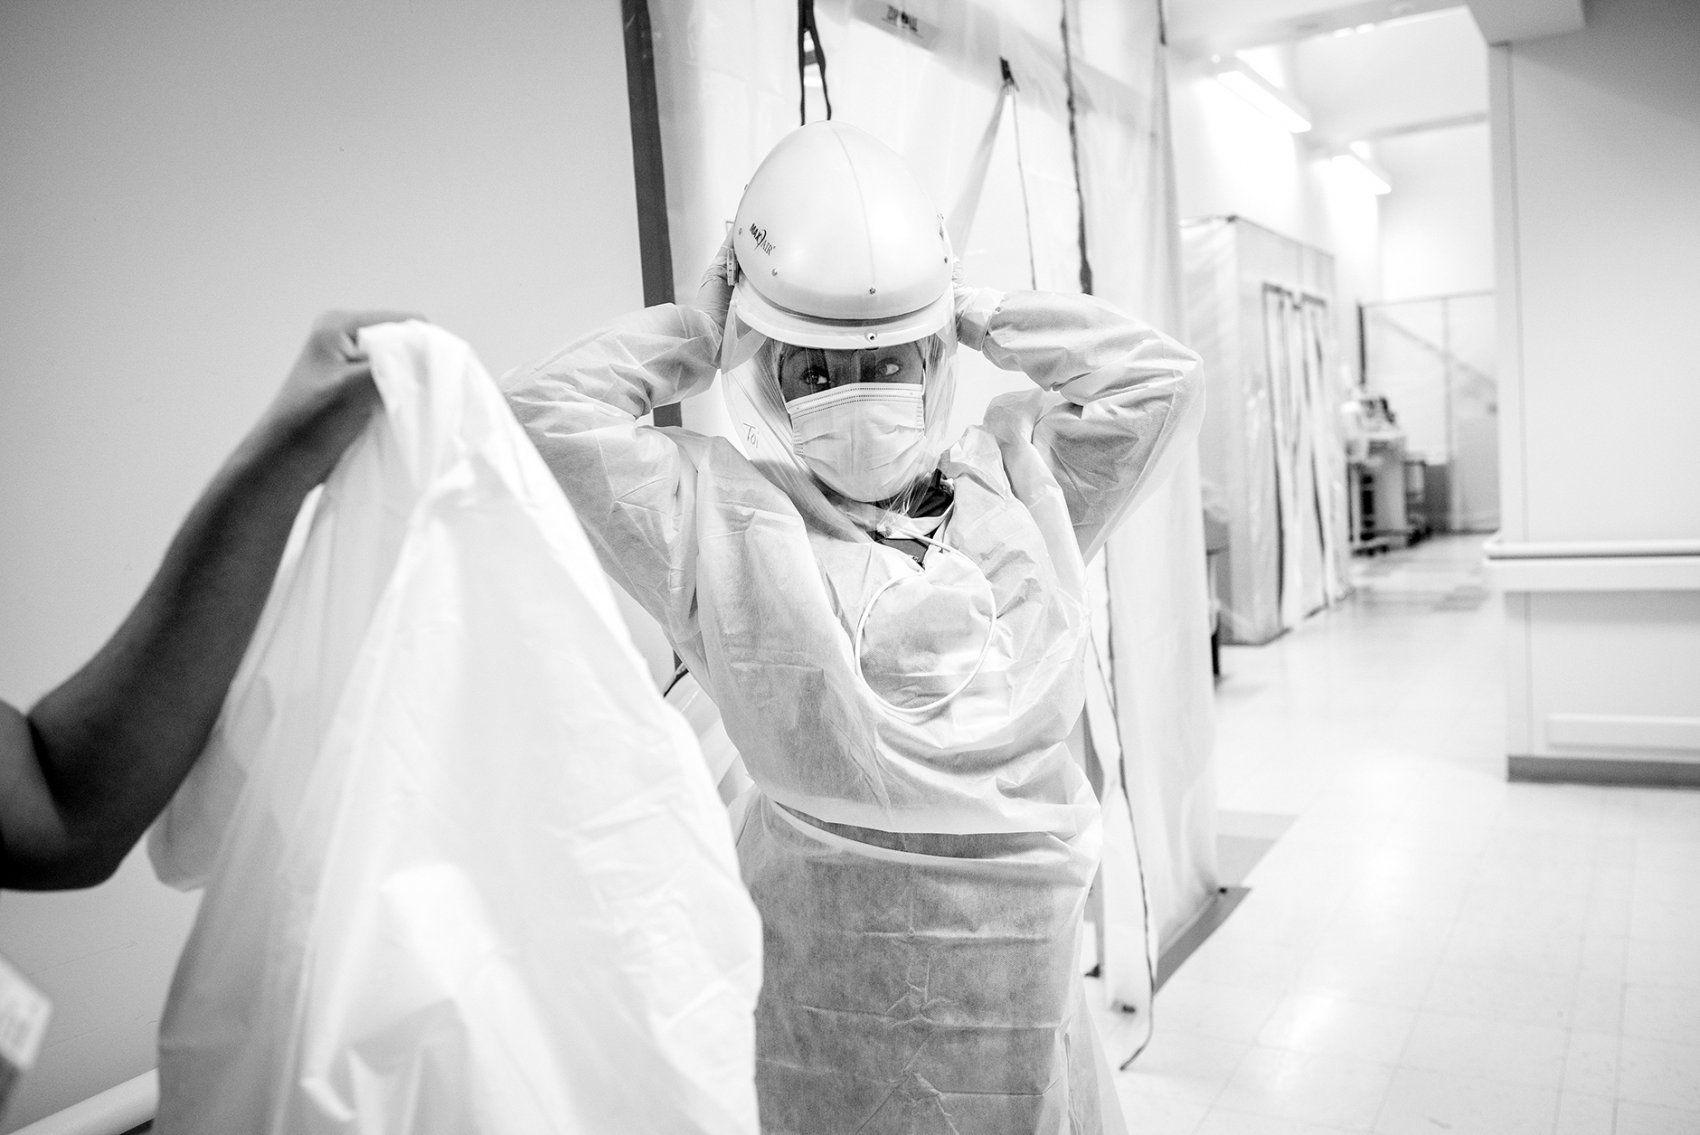 nurse dons protective gear